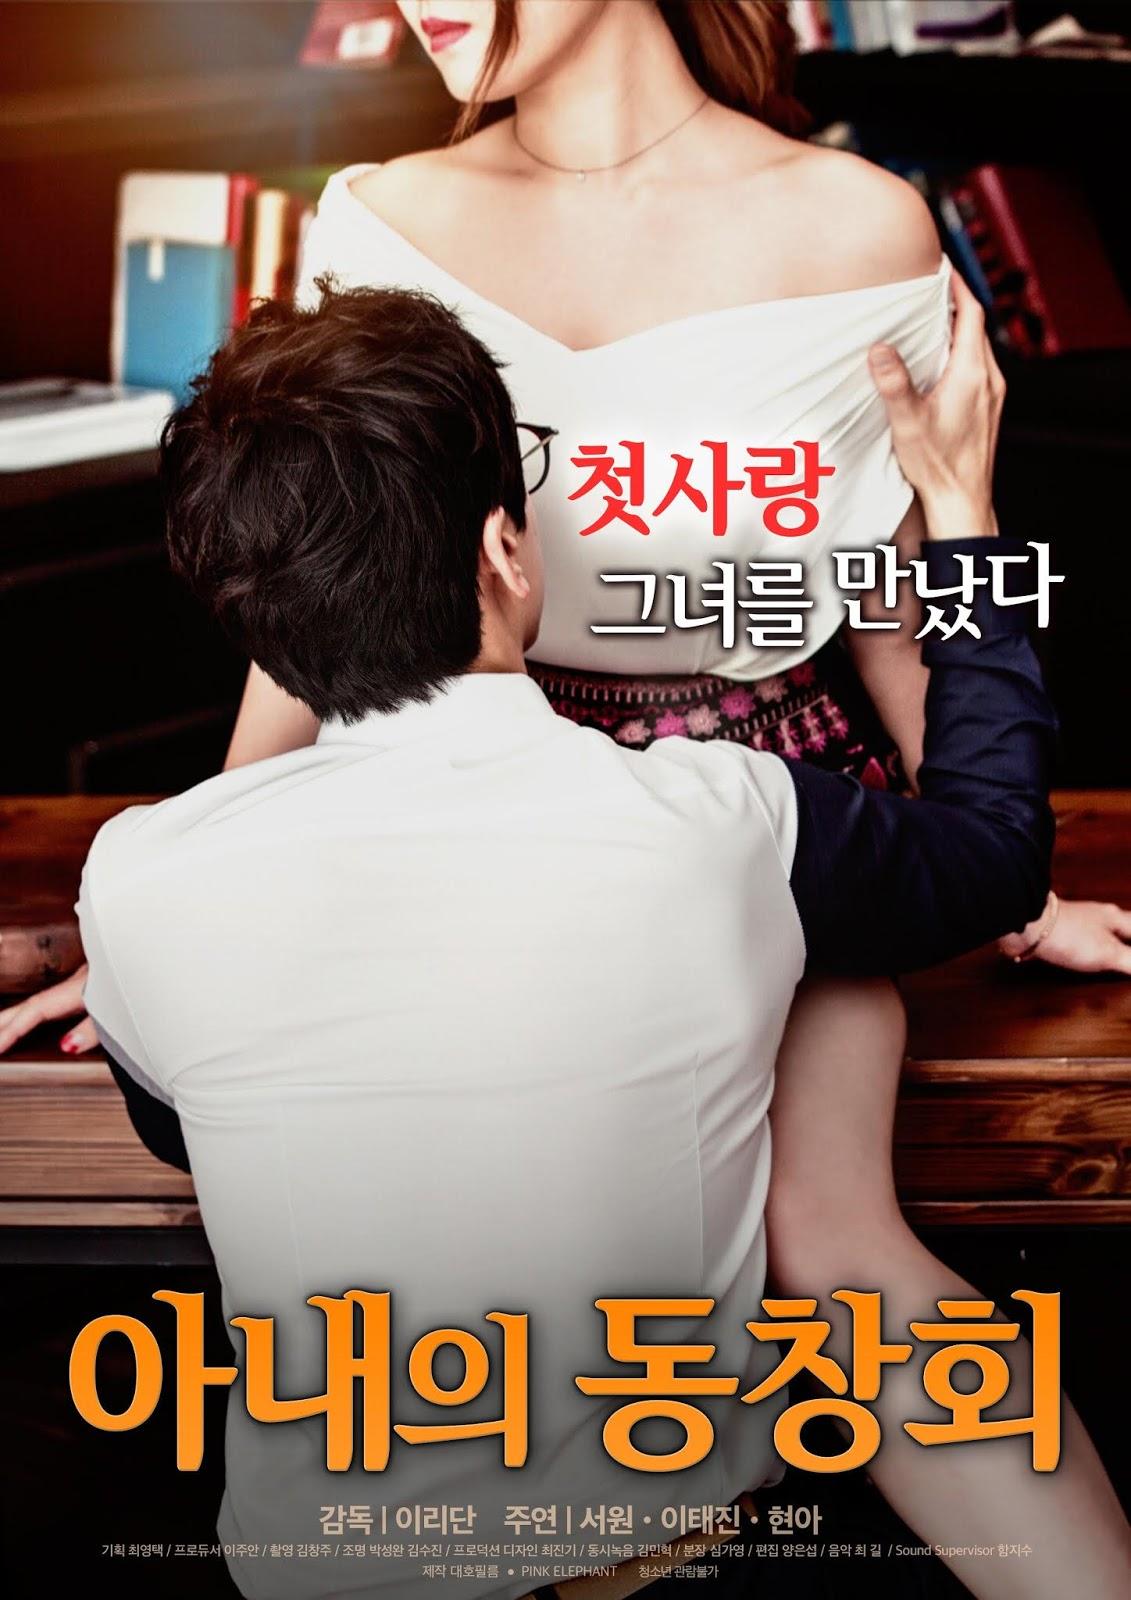 An Affair My Wife's Friend Full Korea Adult 18+ Movie Online